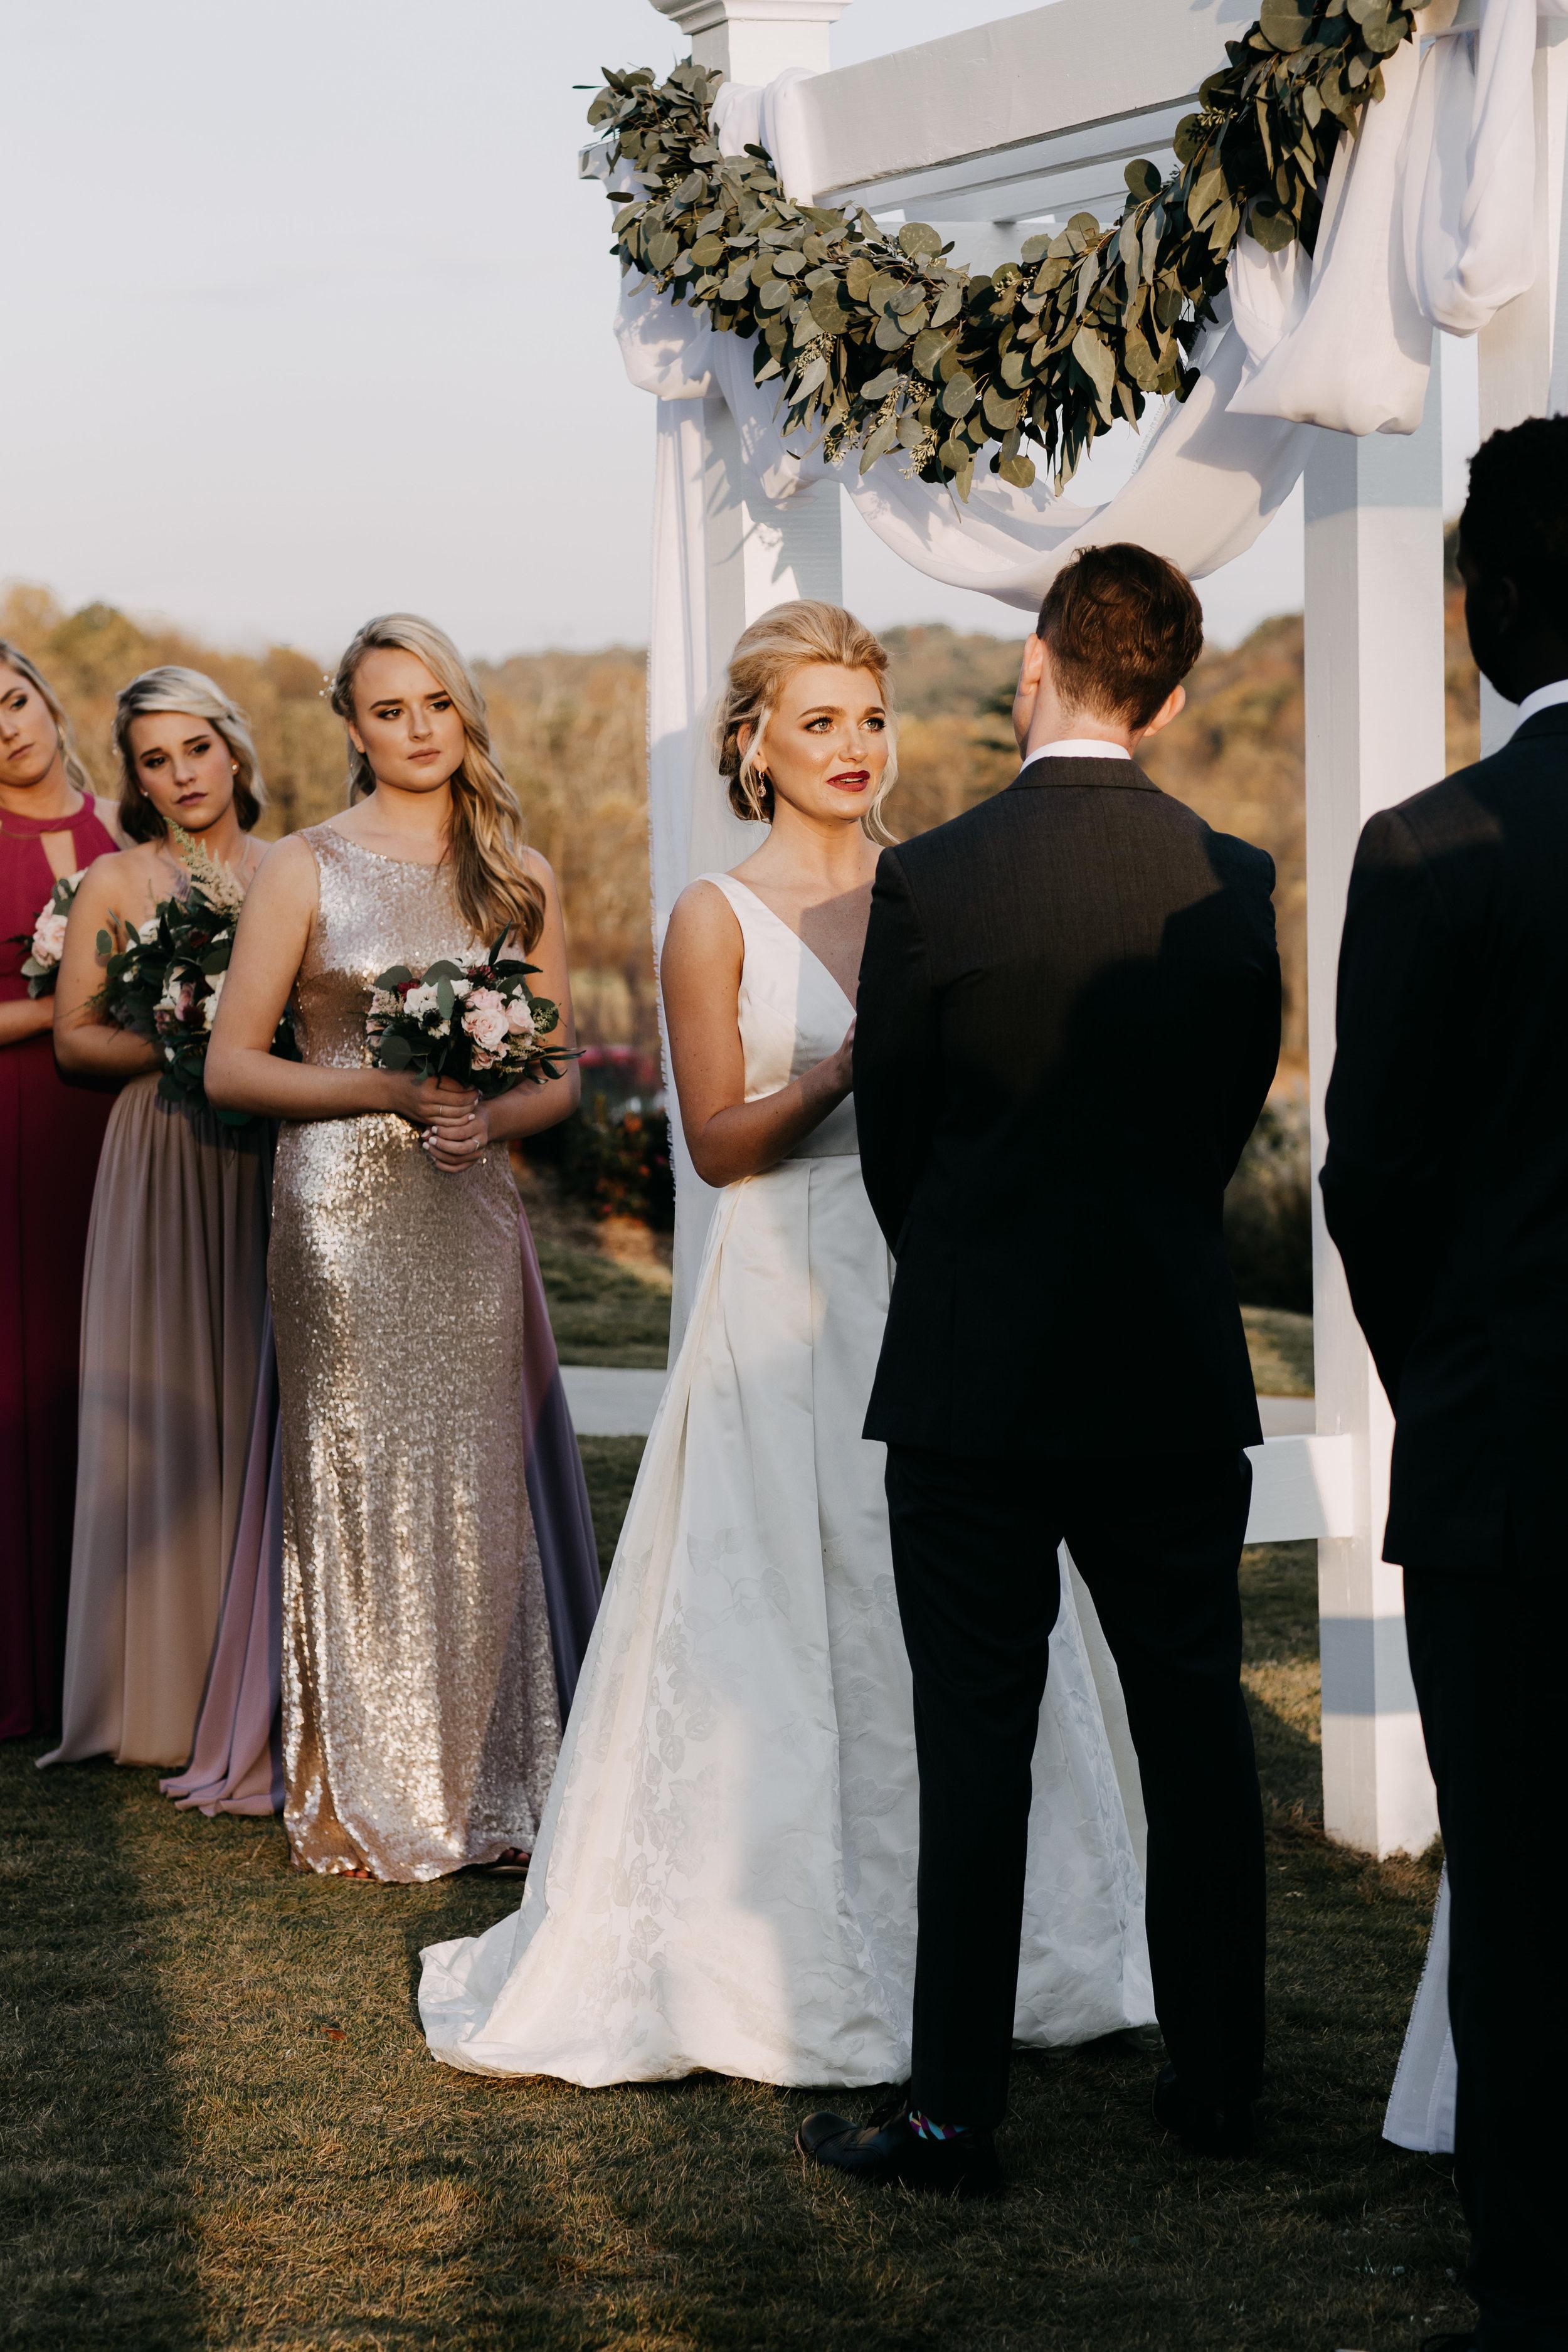 Kaylyn & Ryan Final Wedding Photos366.jpg